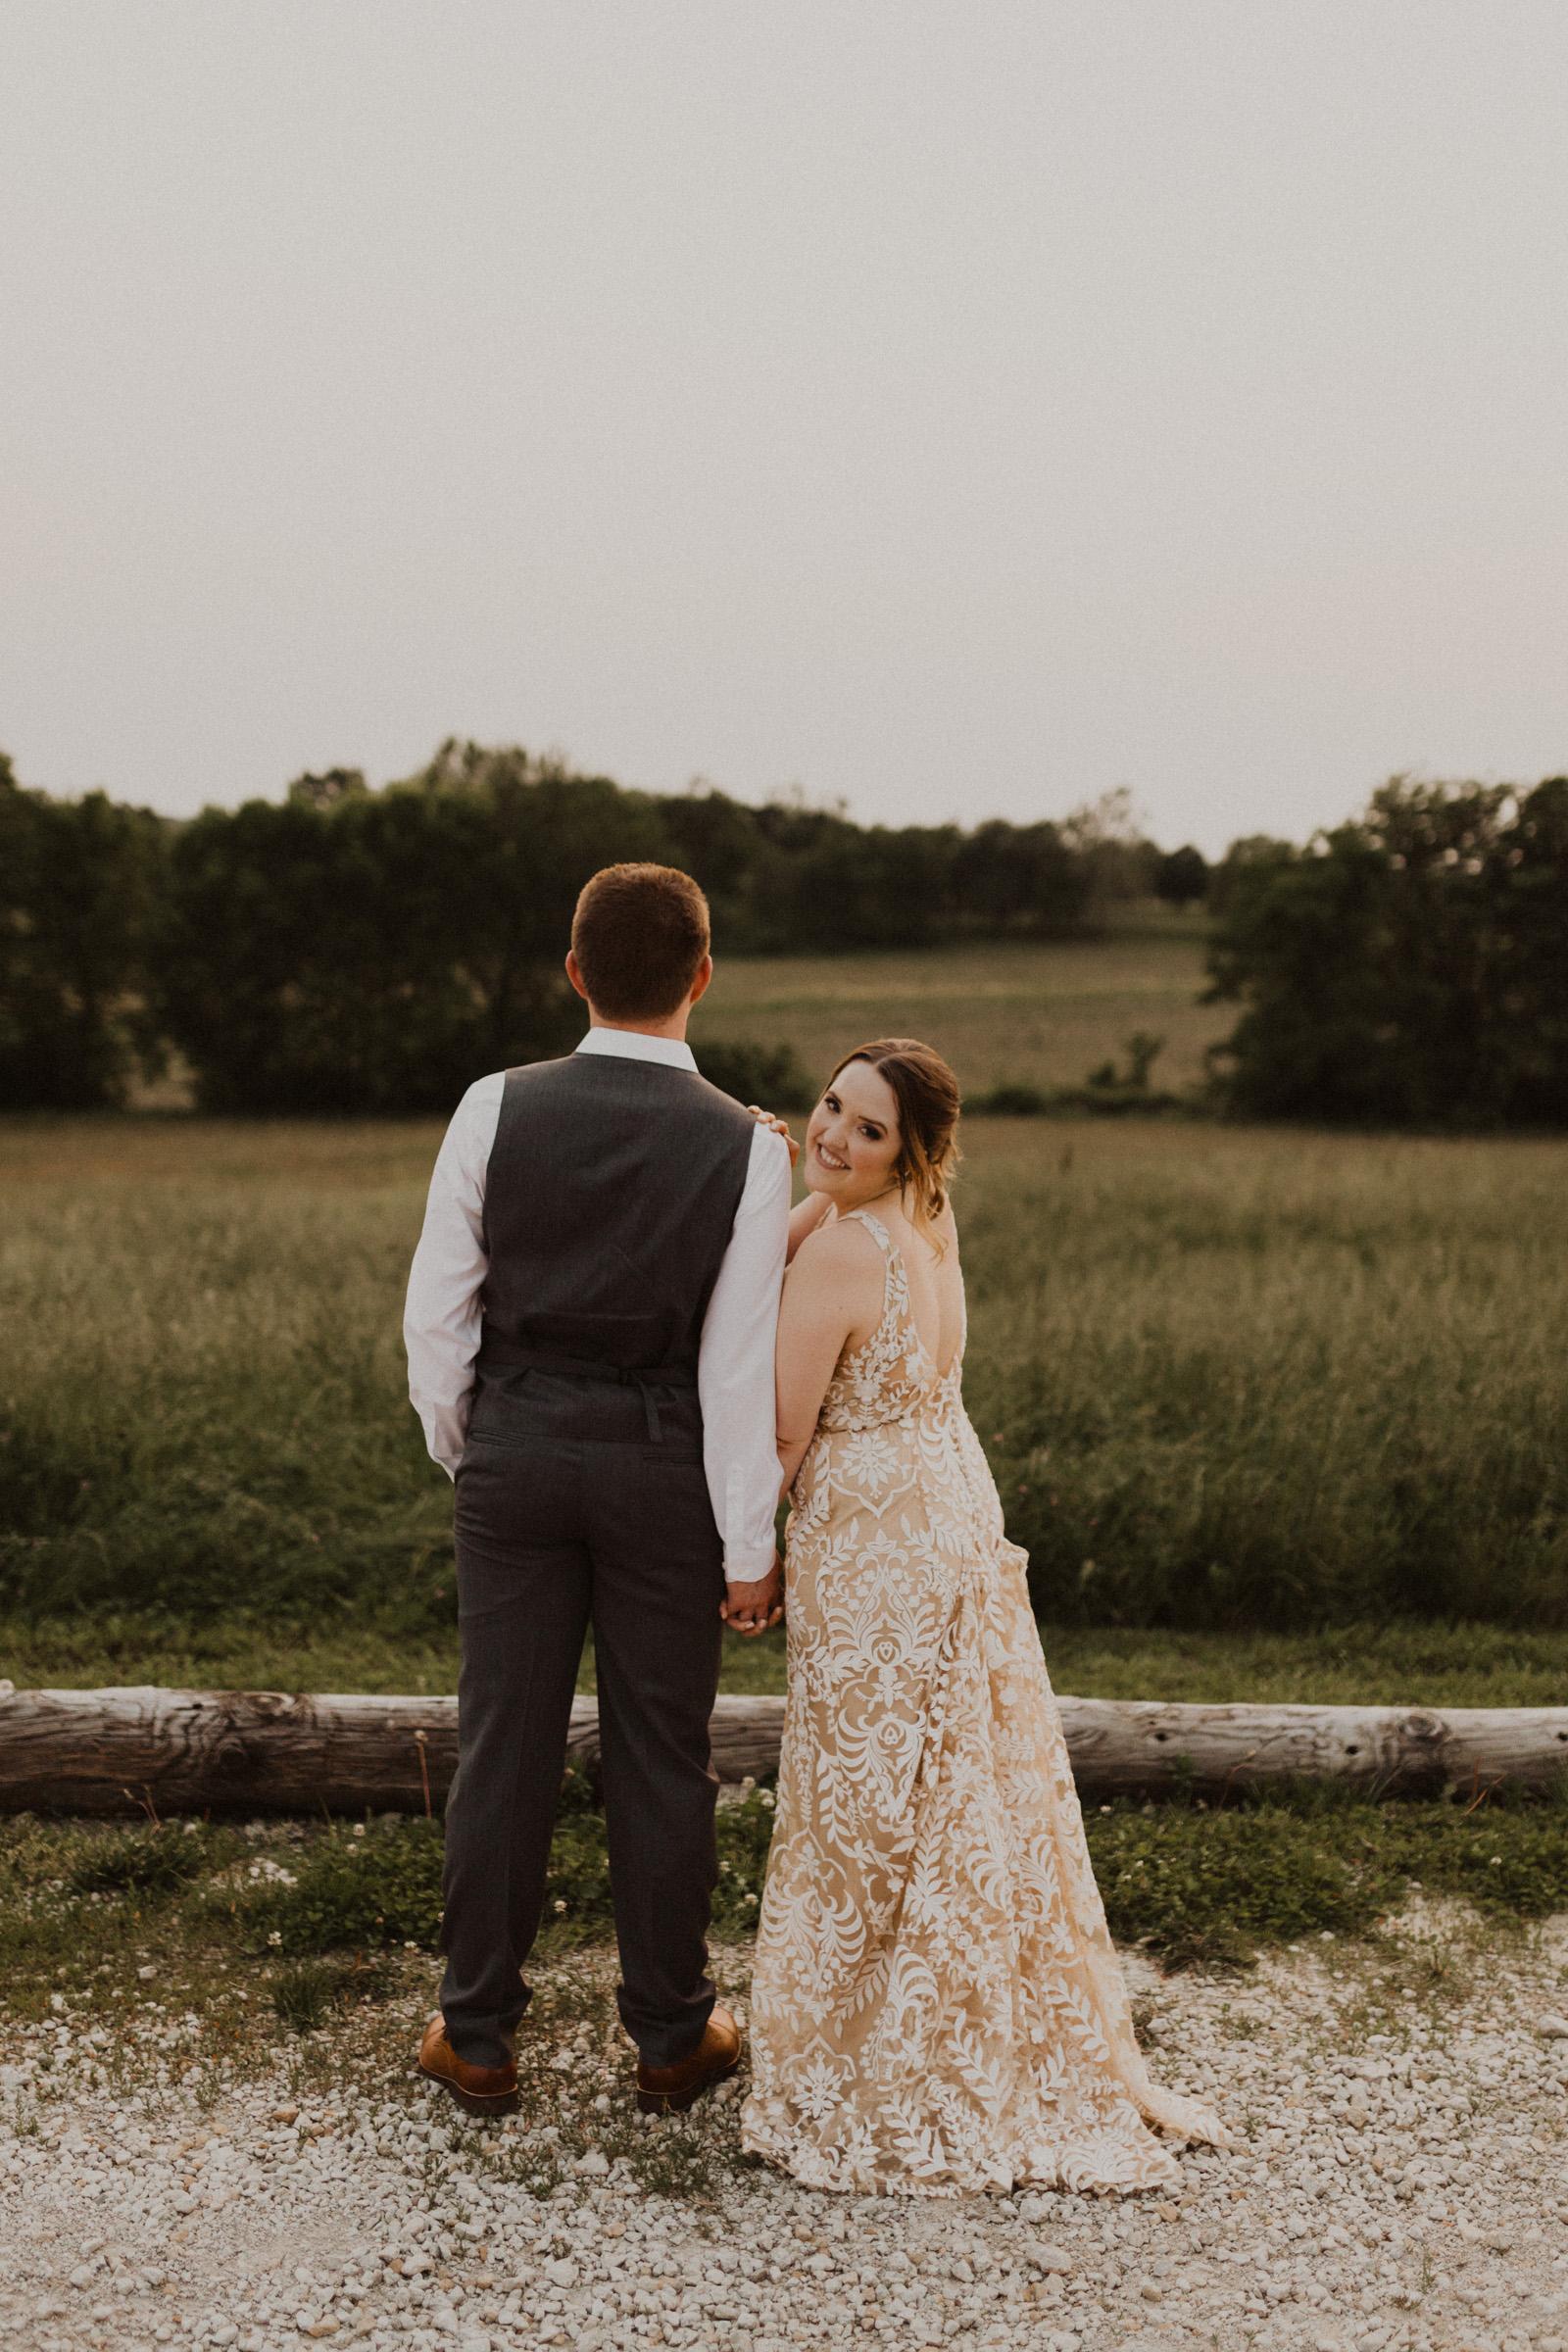 alyssa barletter photography weston red barn farm timberbarn summer outdoor wedding-56.jpg